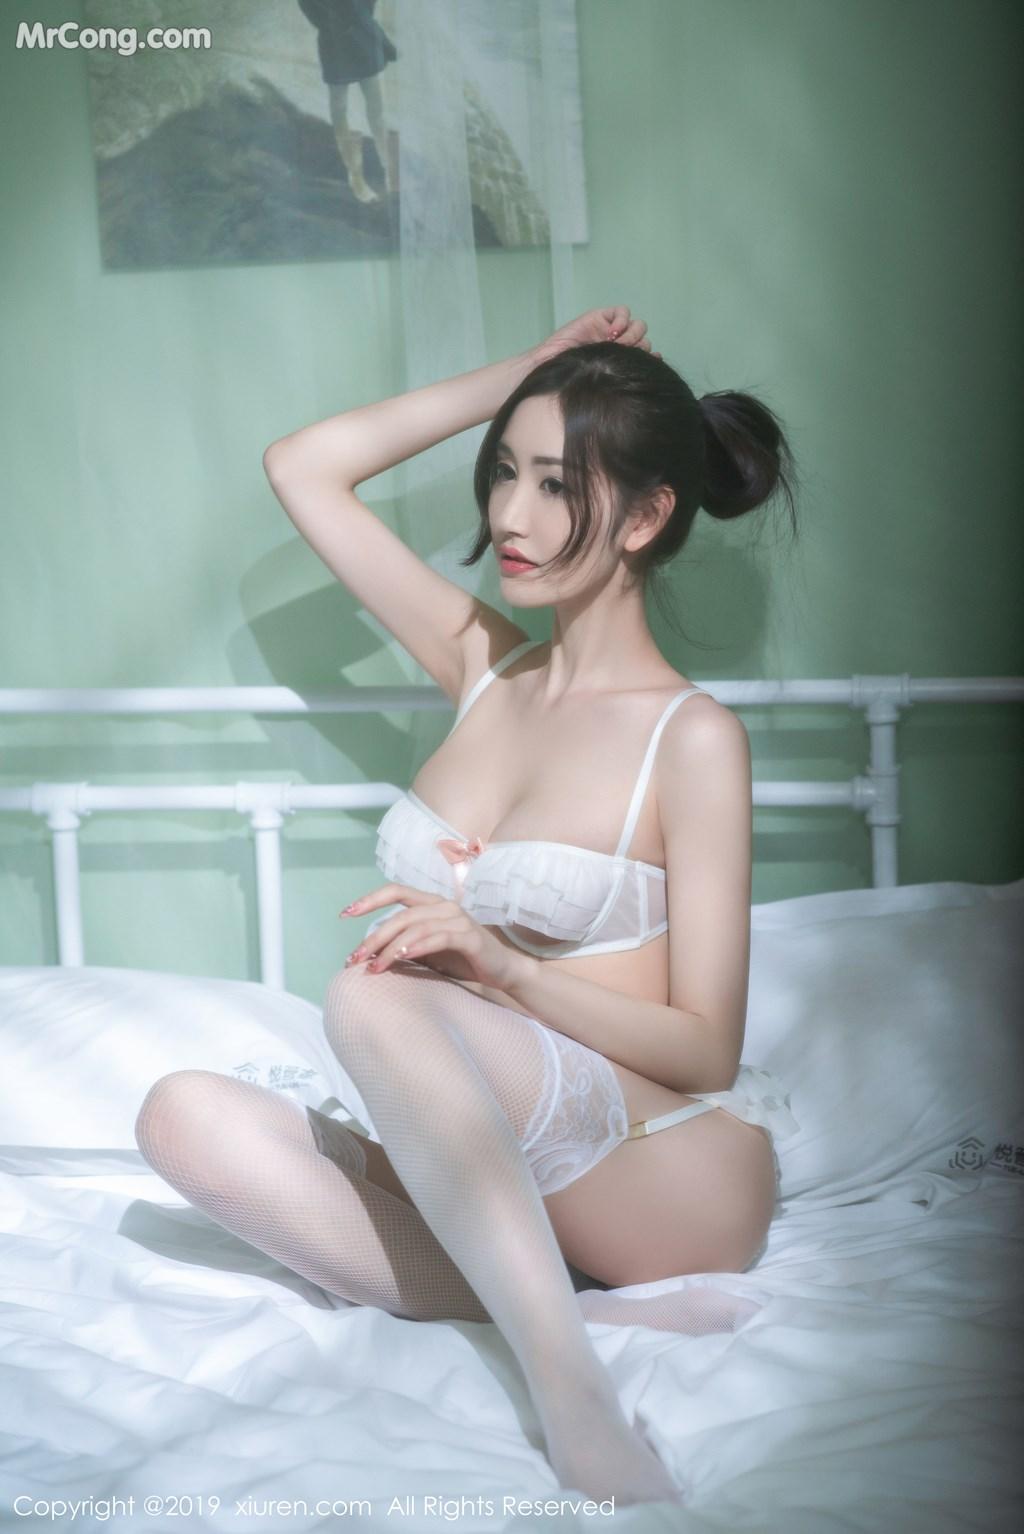 XIUREN No.1693: Shen Mengyao (沈梦瑶) (41P)